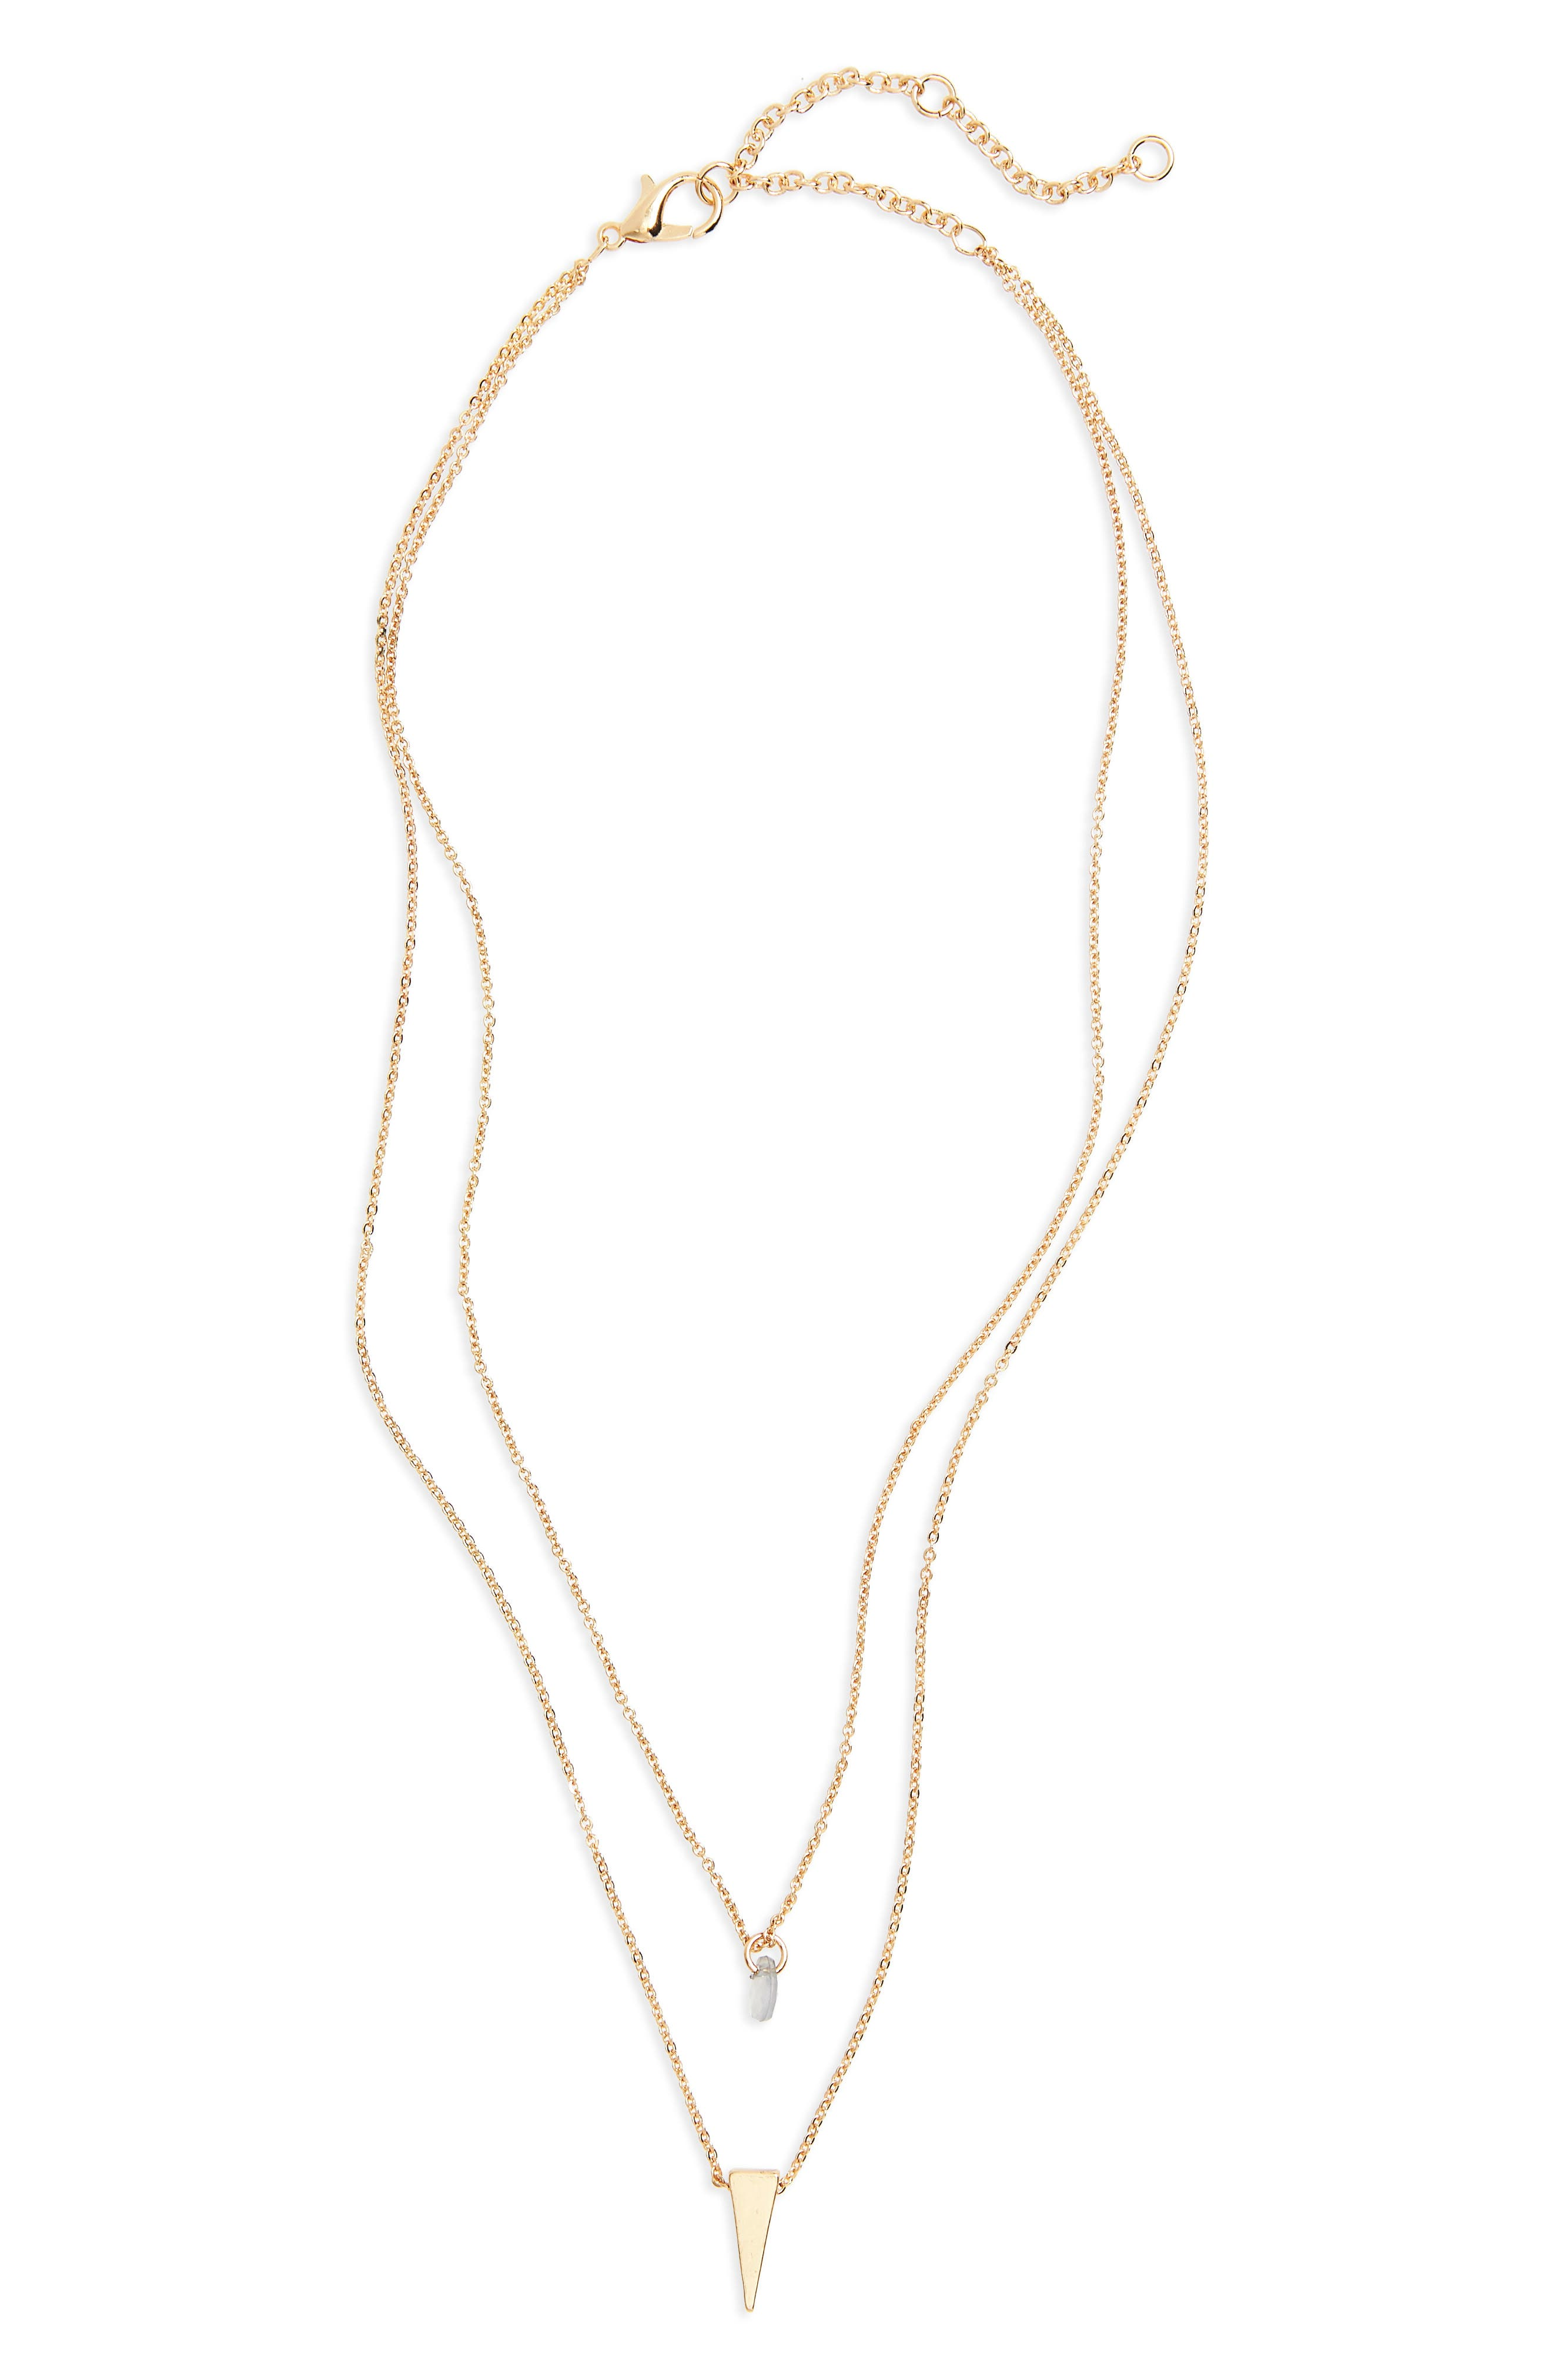 Layered Mixed Pendant Necklace,                             Main thumbnail 1, color,                             710